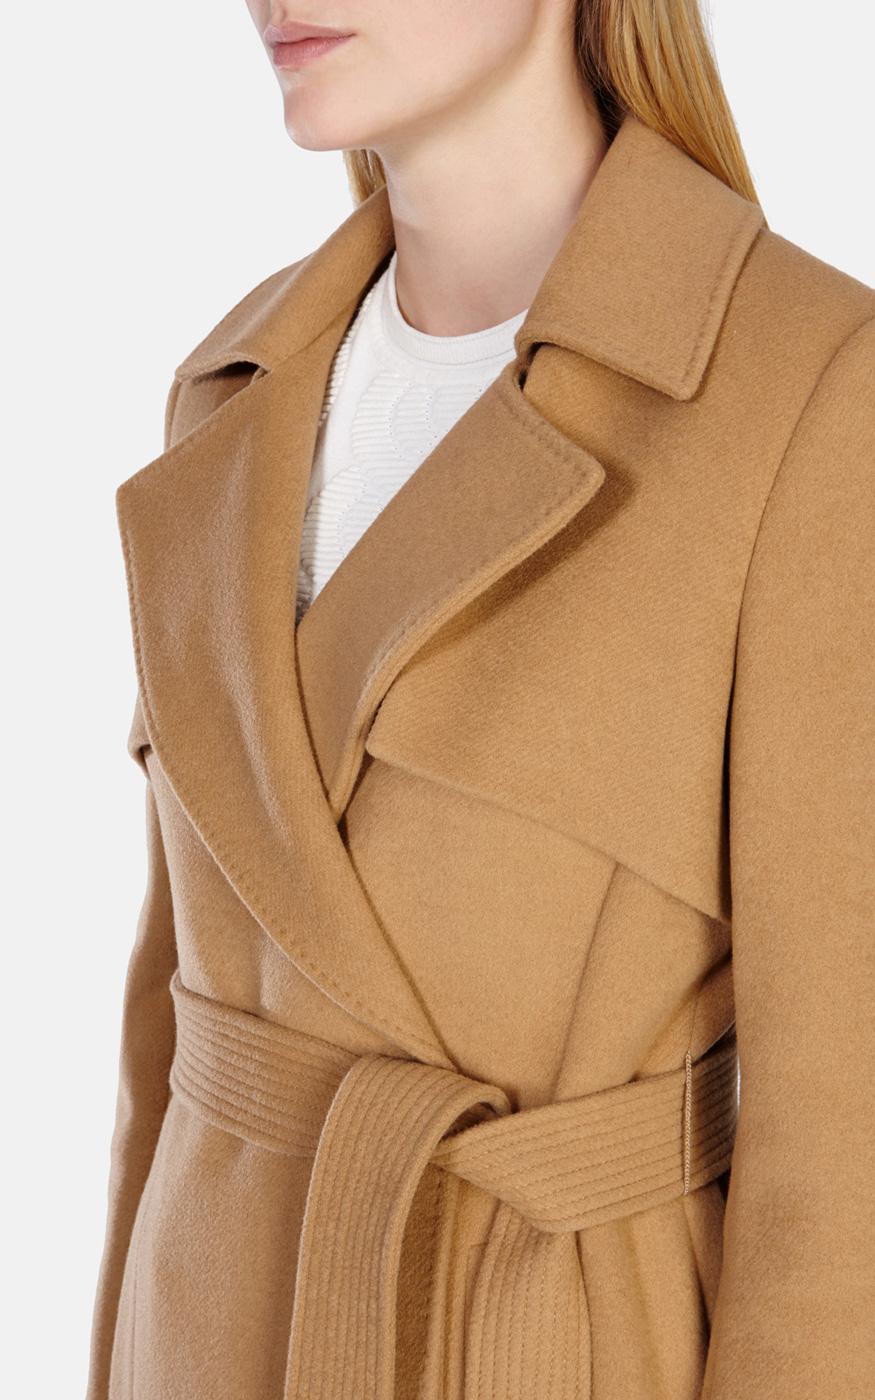 shop for 50-70%off info for Karen Millen Wool Longline Camel Trenchcoat in Natural - Lyst